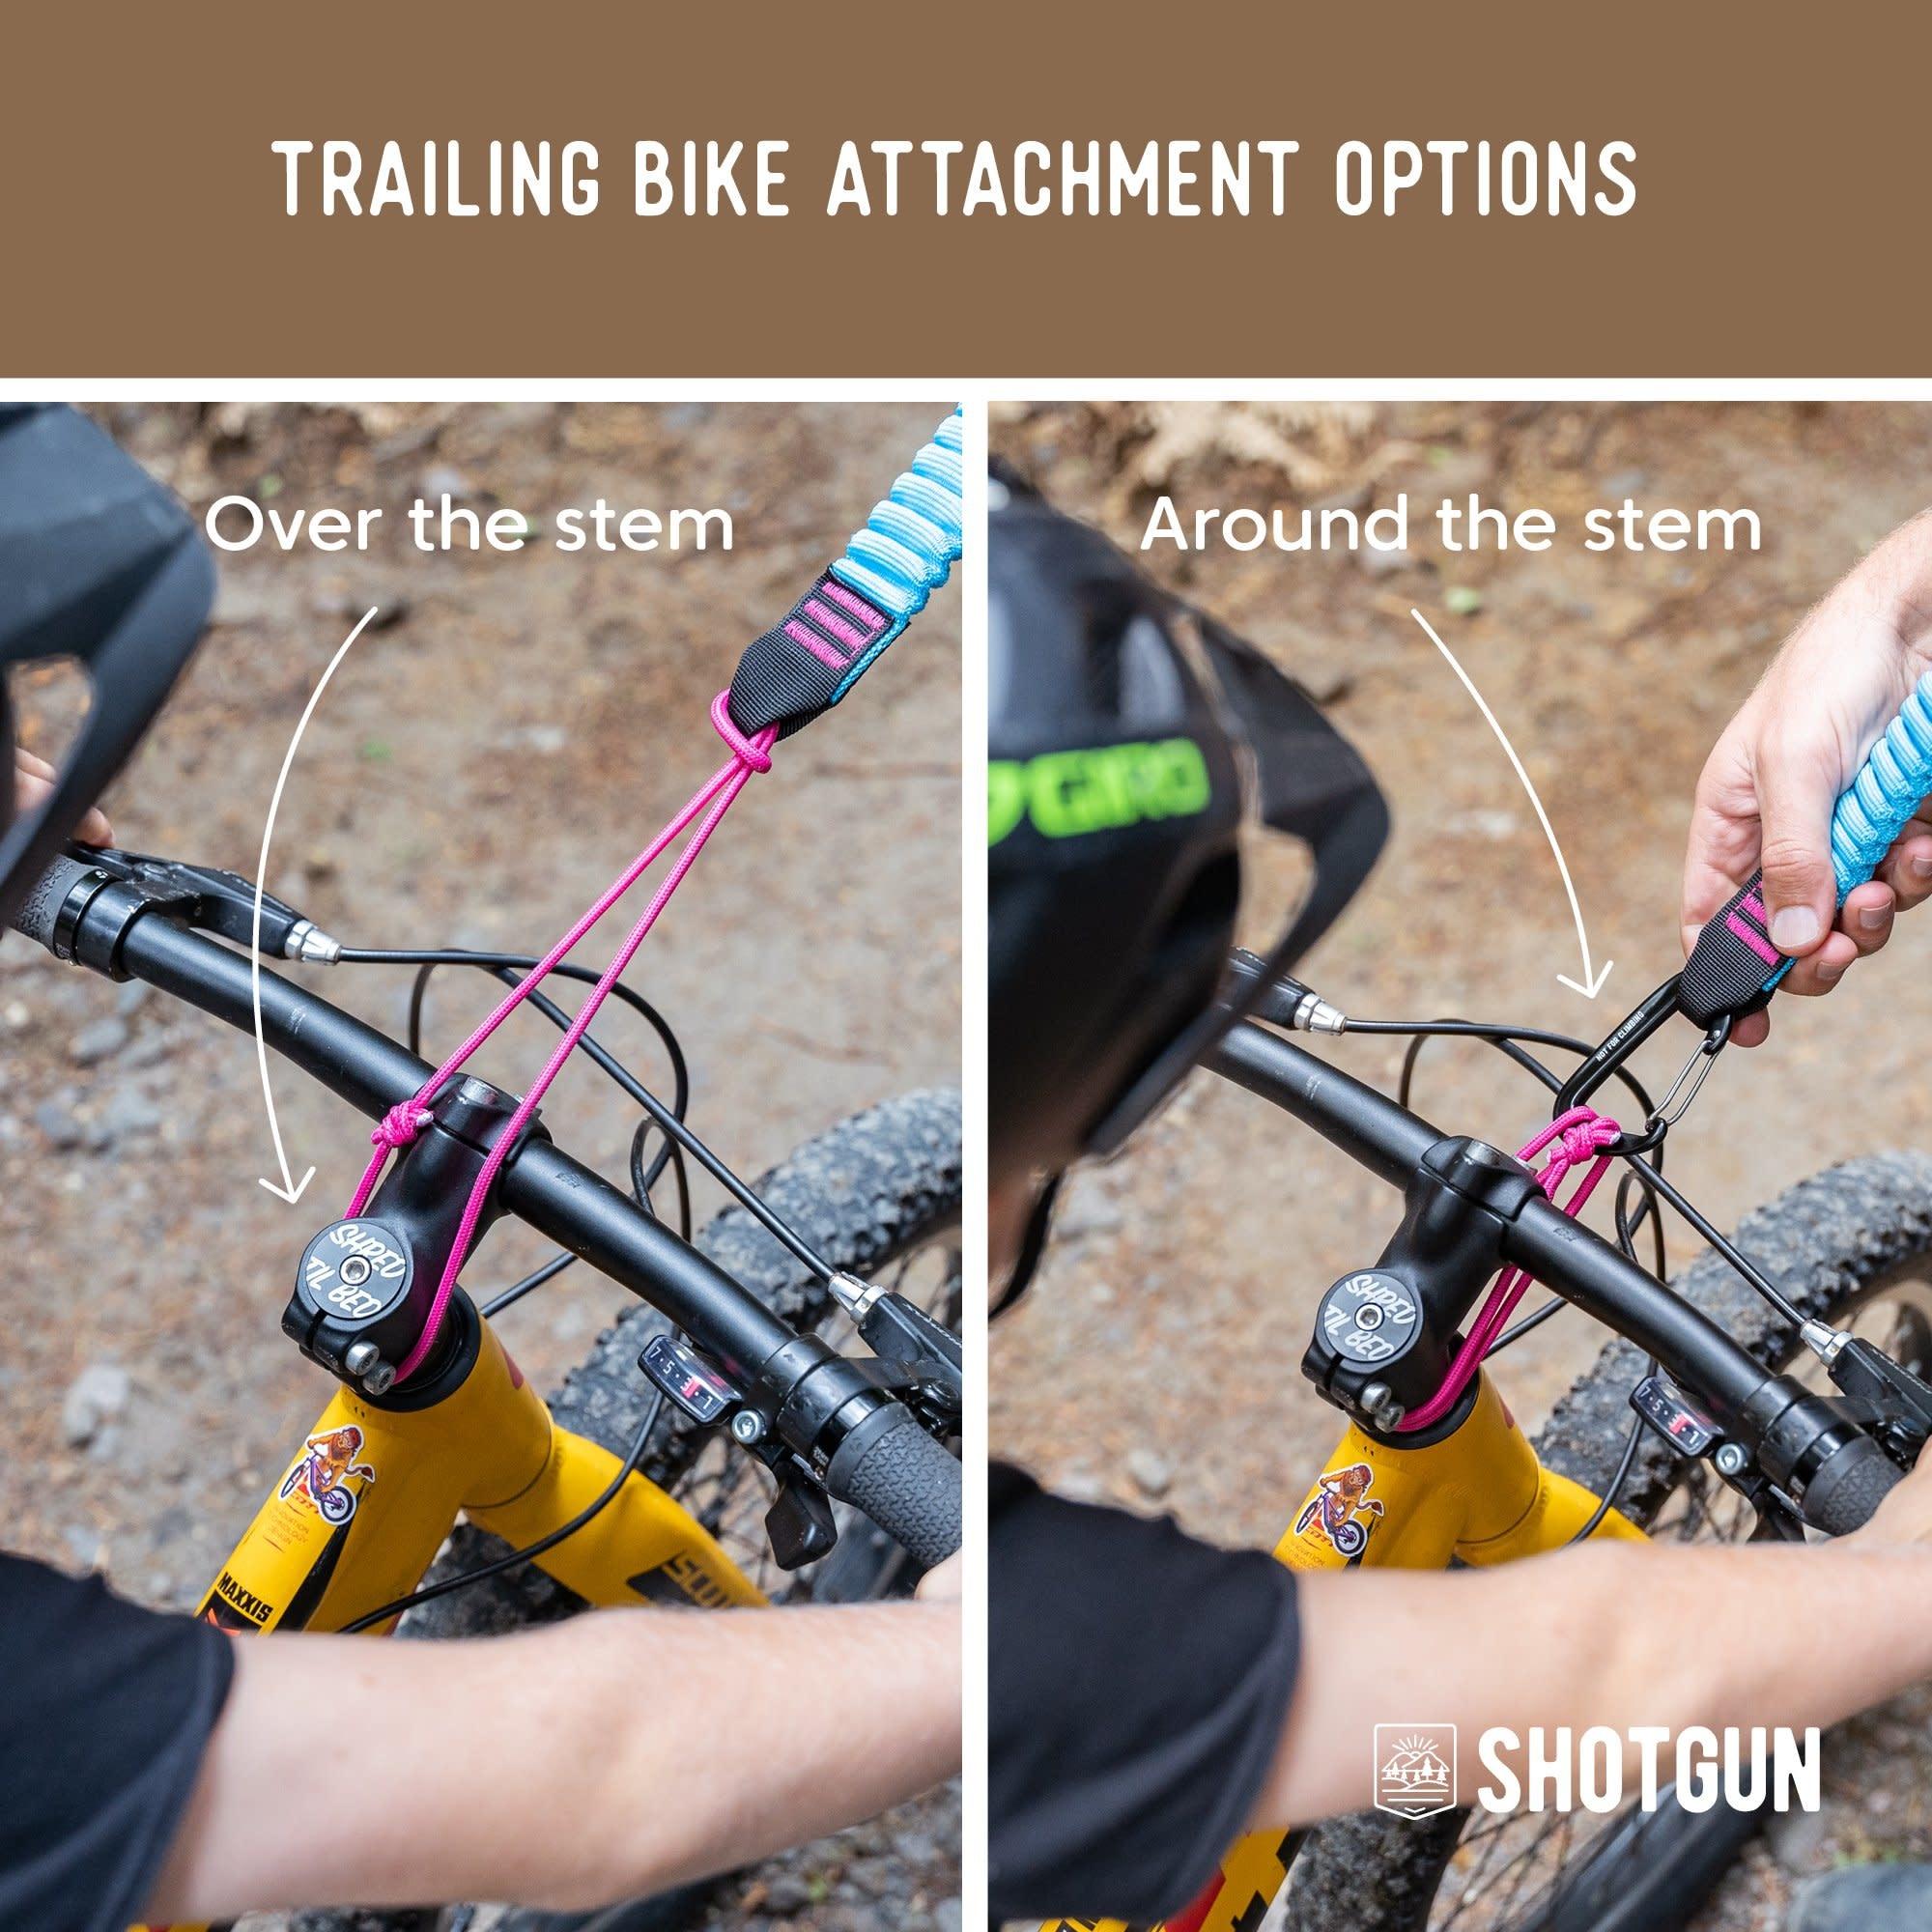 Shotgun Shotgun MTB Tow Rope